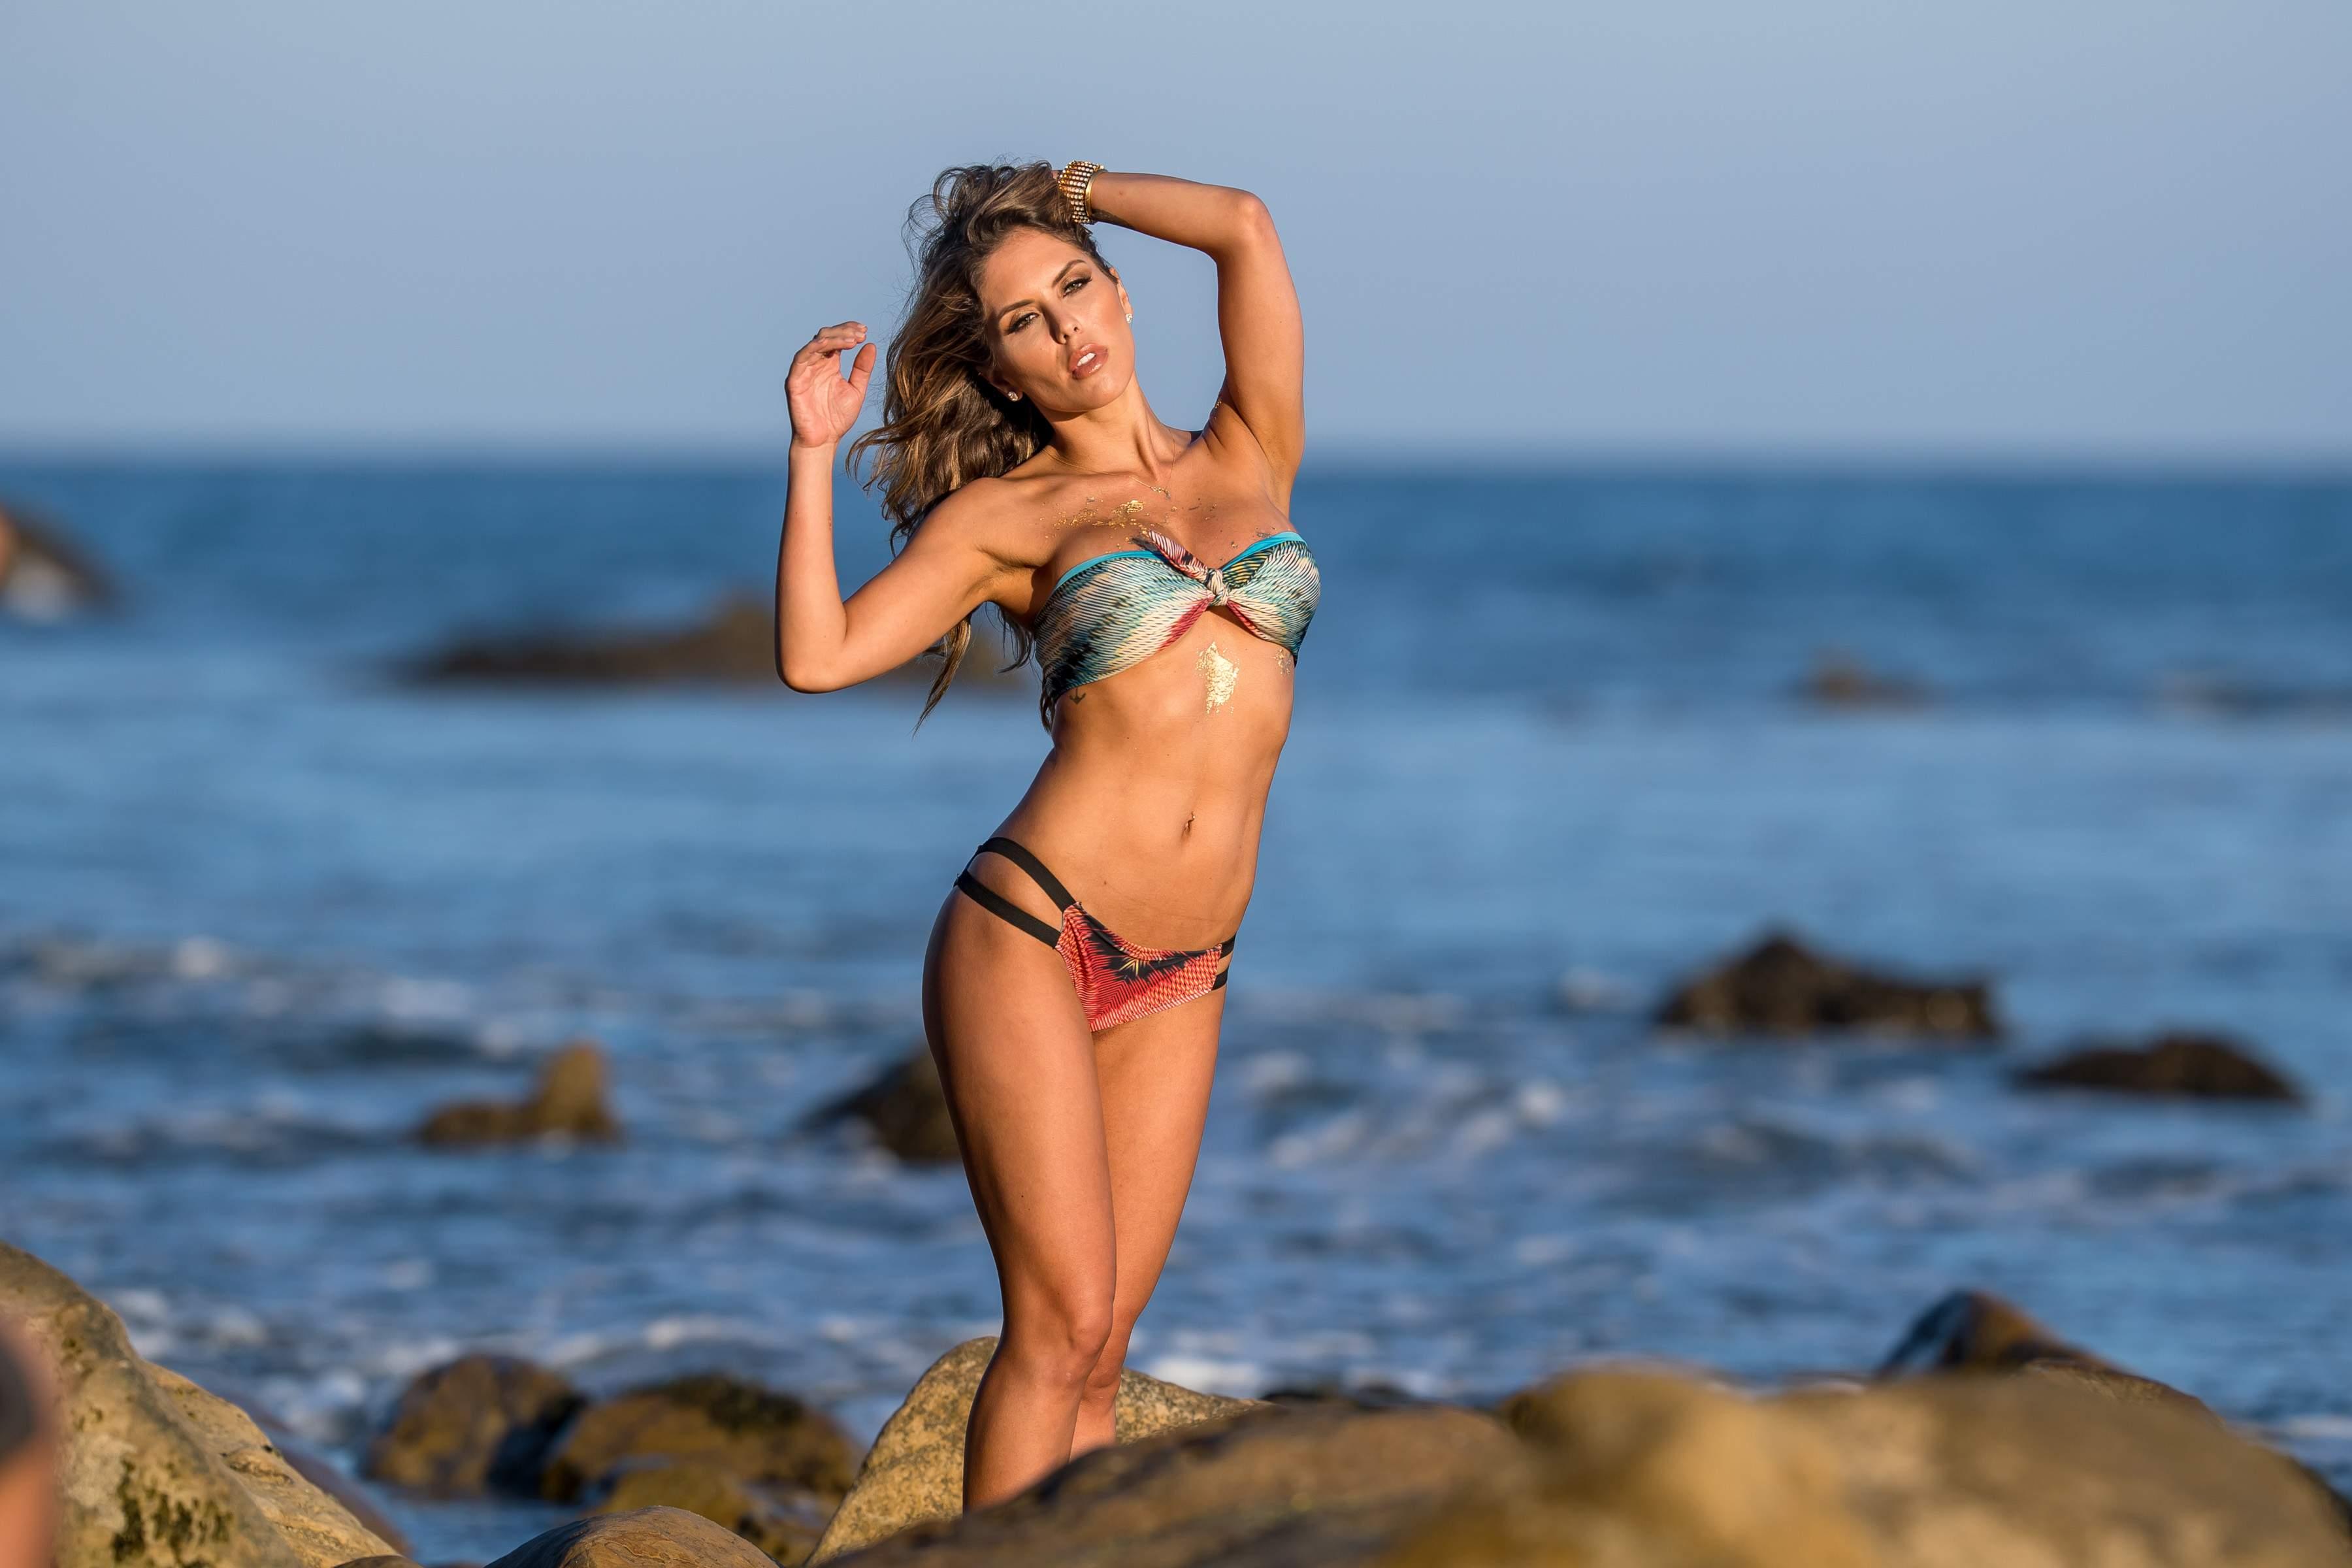 Brittney-Palmer-Sexy-3-thefappeningblog.com_.jpg